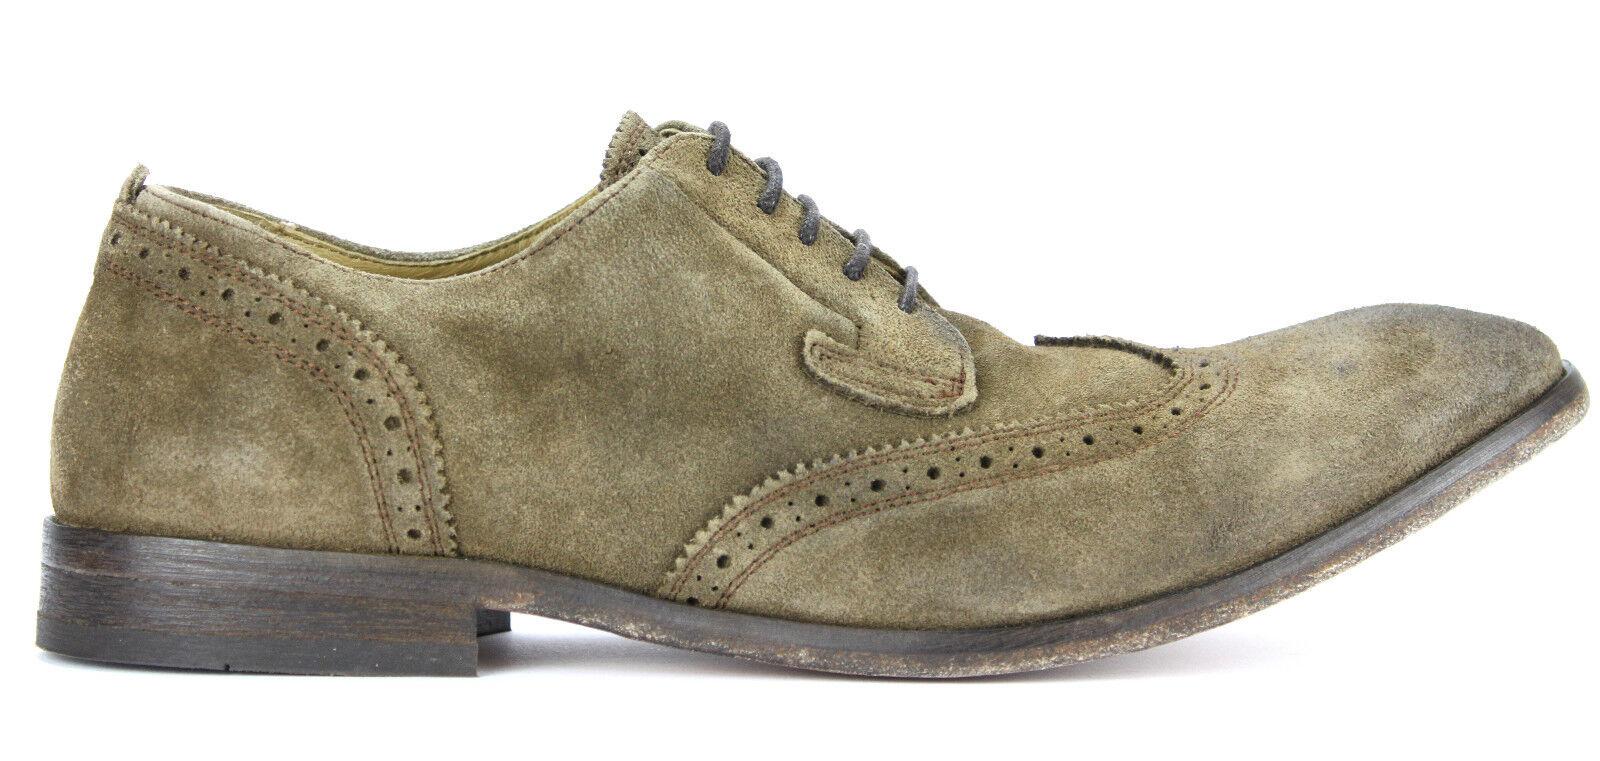 H by Hudson Shoes Halbschuh Budapester ROWE SUEDE tobacco braun Neu UVP 189,90